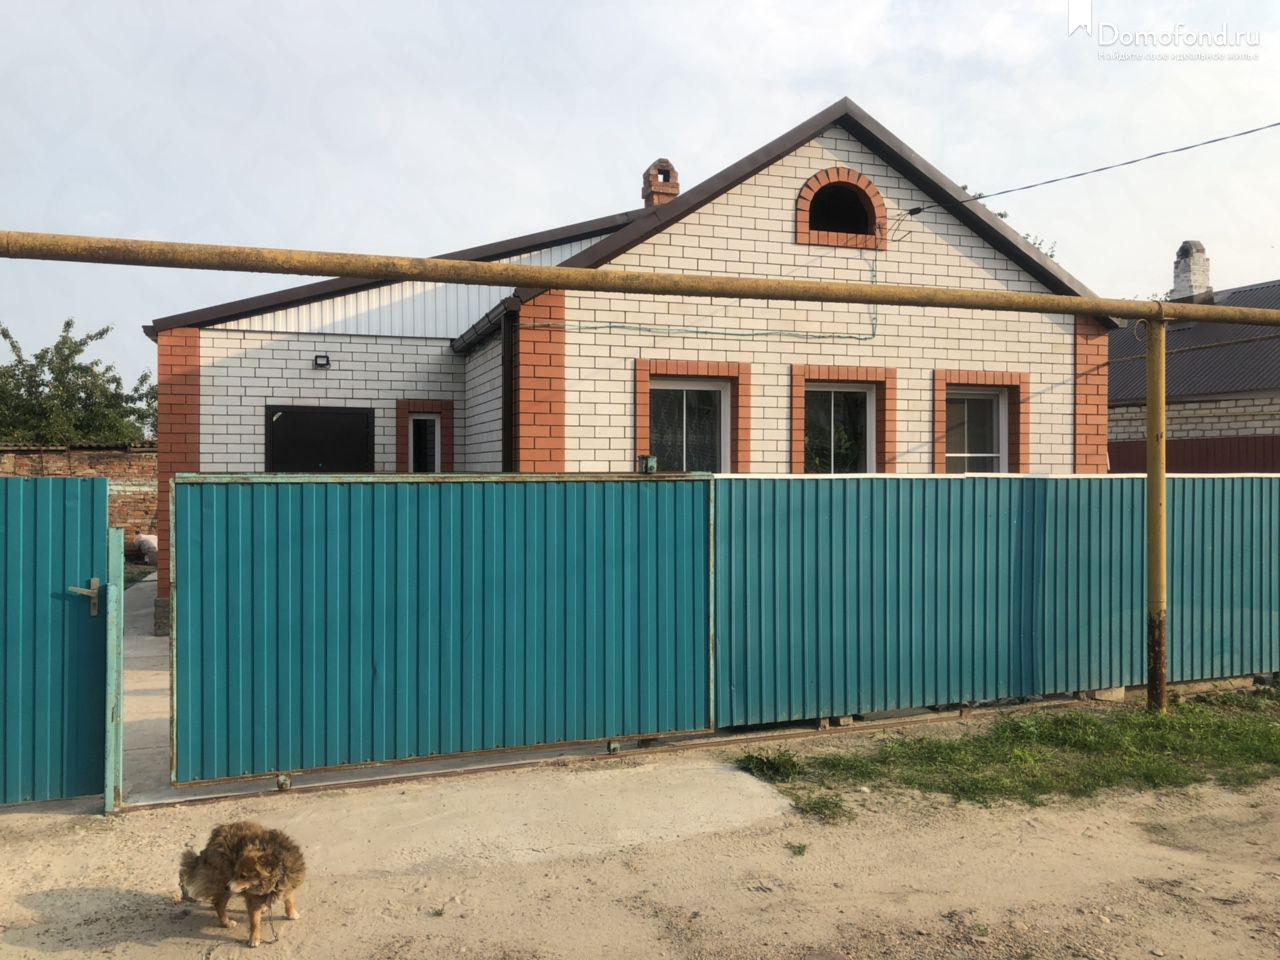 фото пос гирей краснодарский край